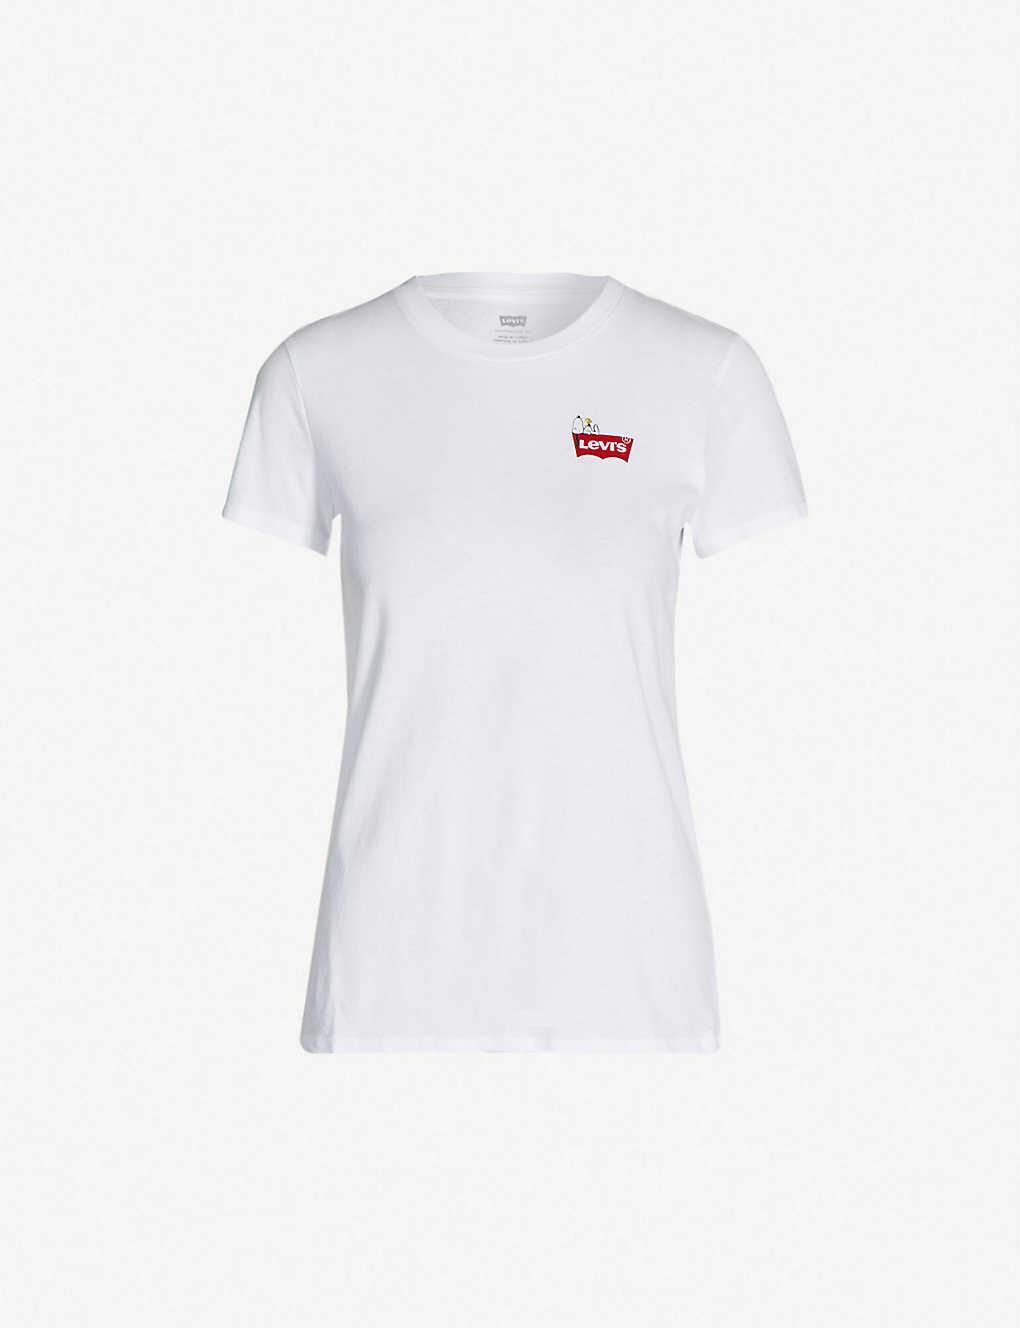 02ac6db872c60 LEVI S - Perfect tee snoopy logo-print cotton-jersey T-shirt ...